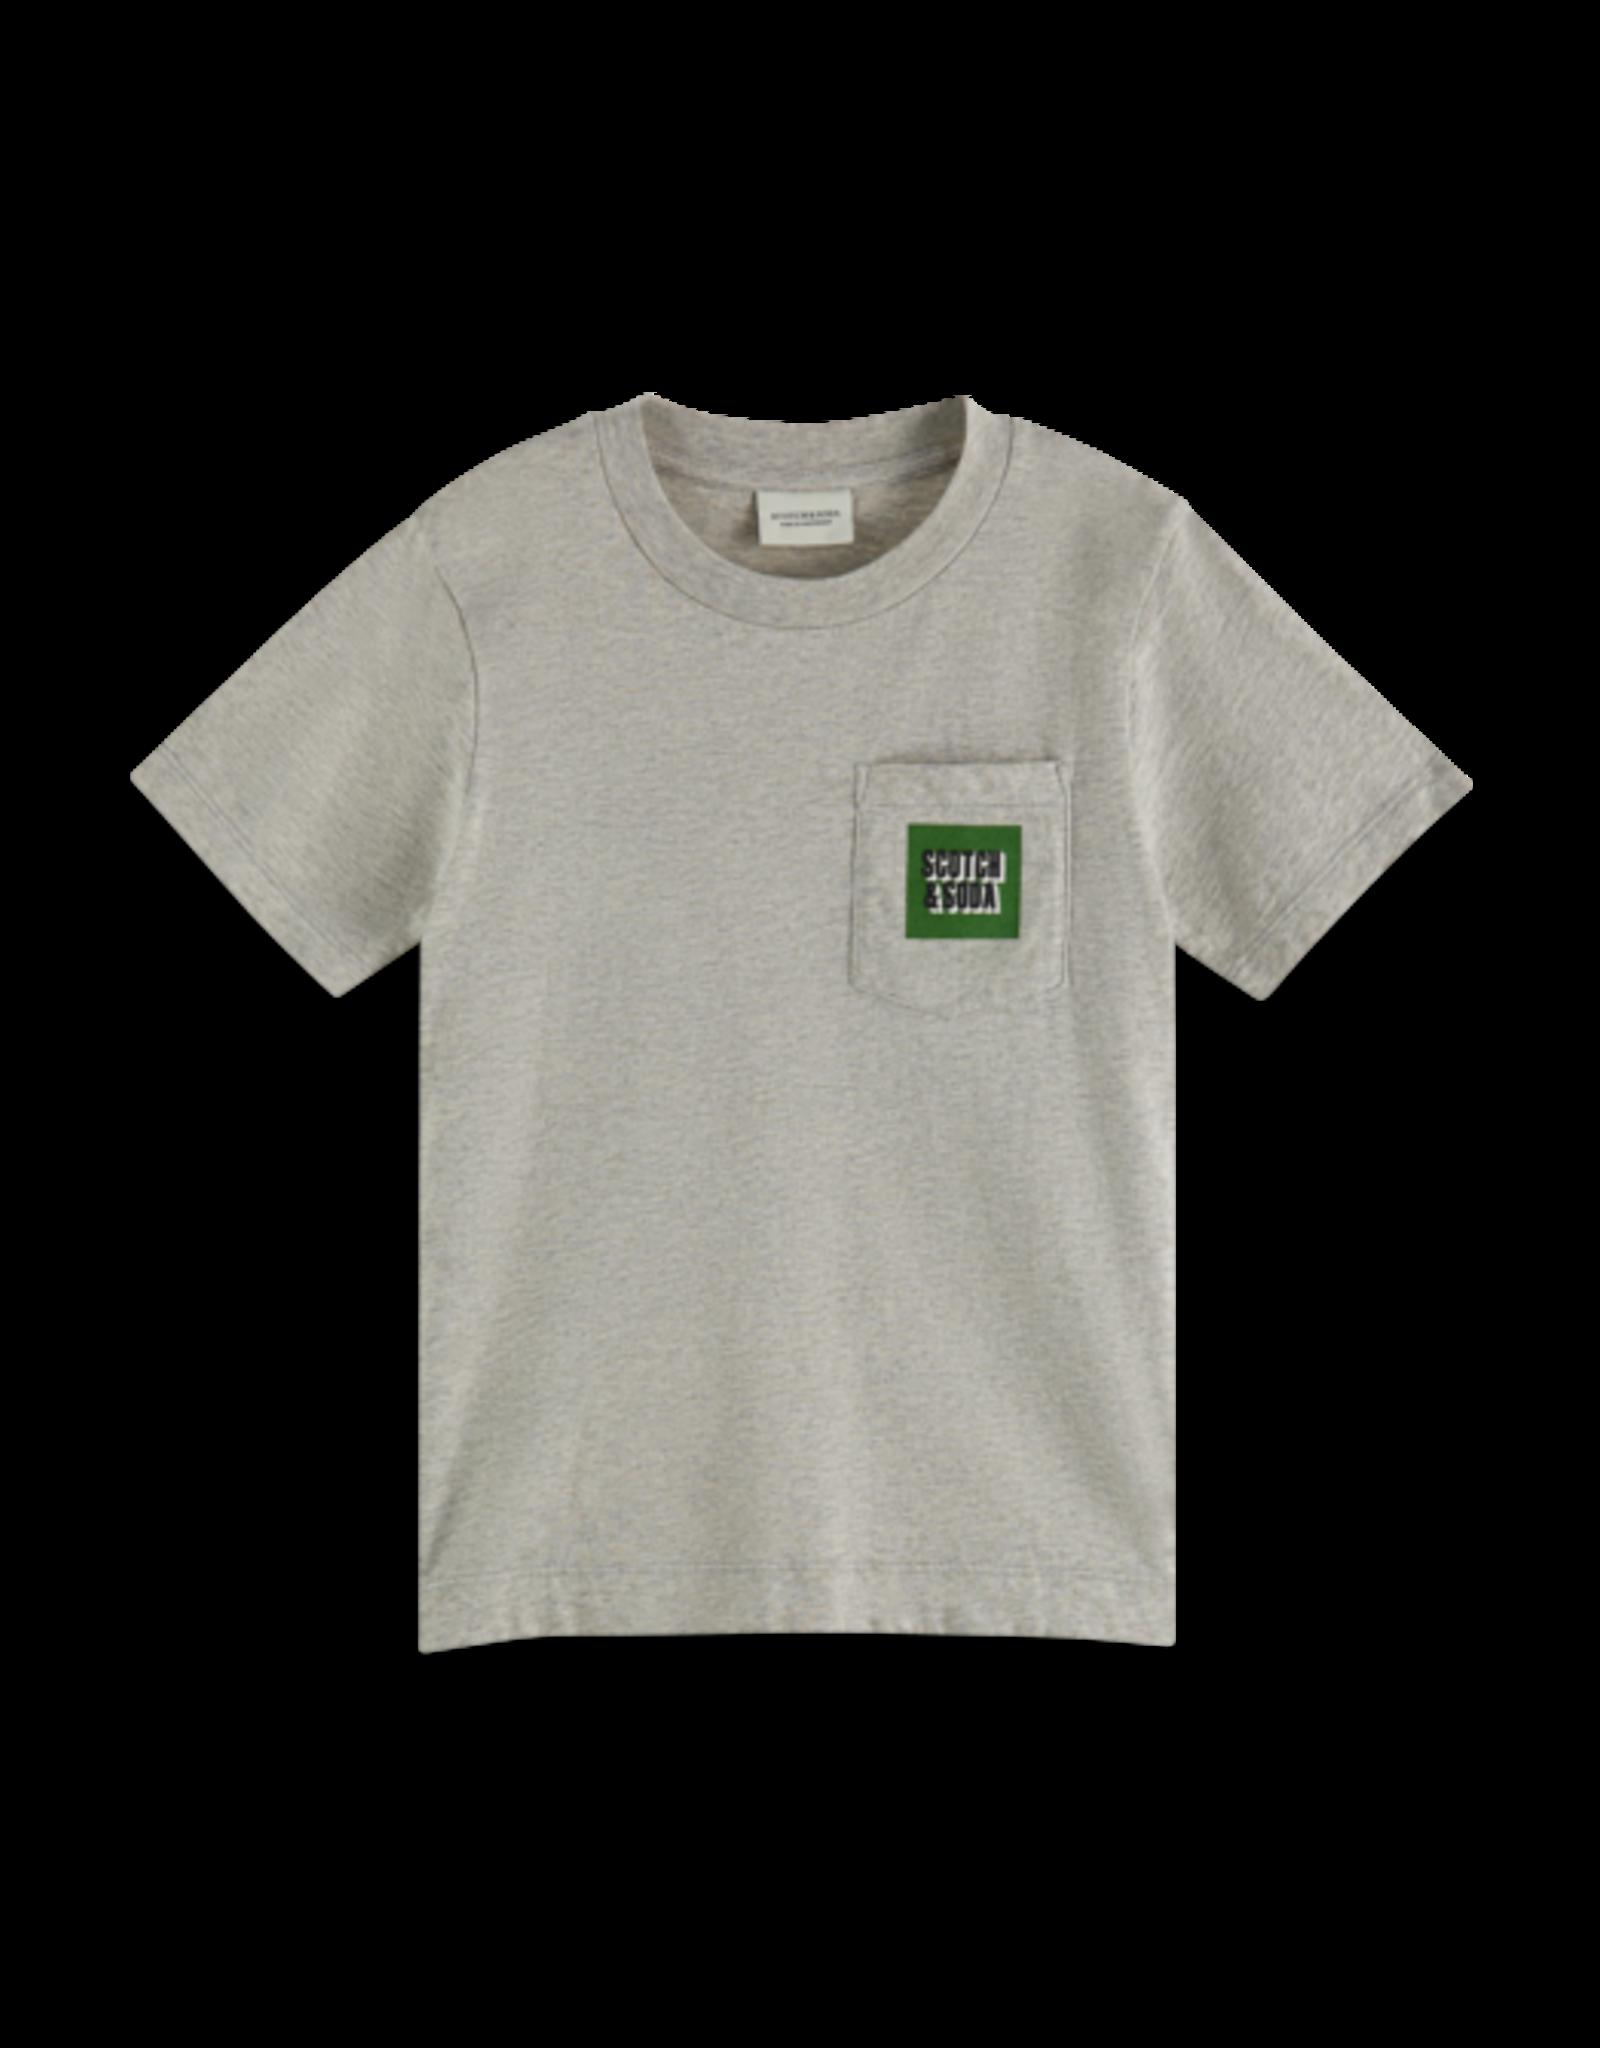 Scotch&Soda Scotch&Soda FW21 162746 printed t-shirt